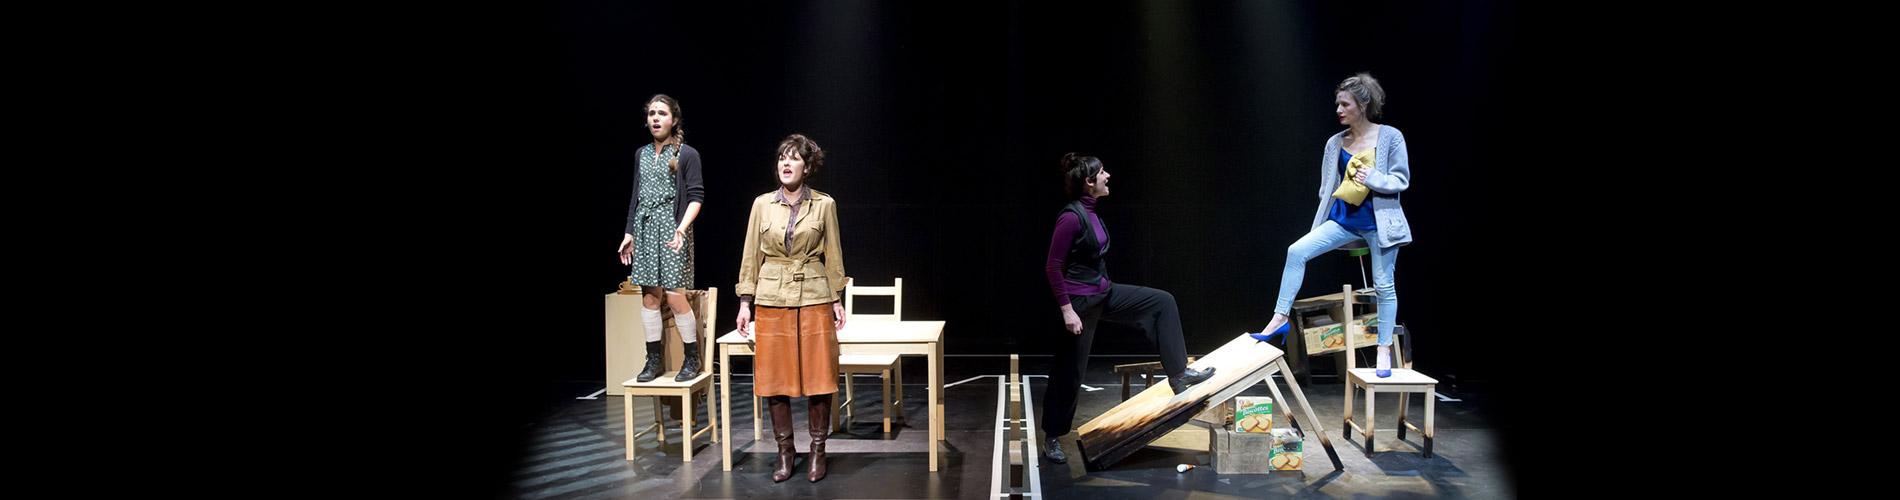 festival-saint-cere-2017-theatre-musical